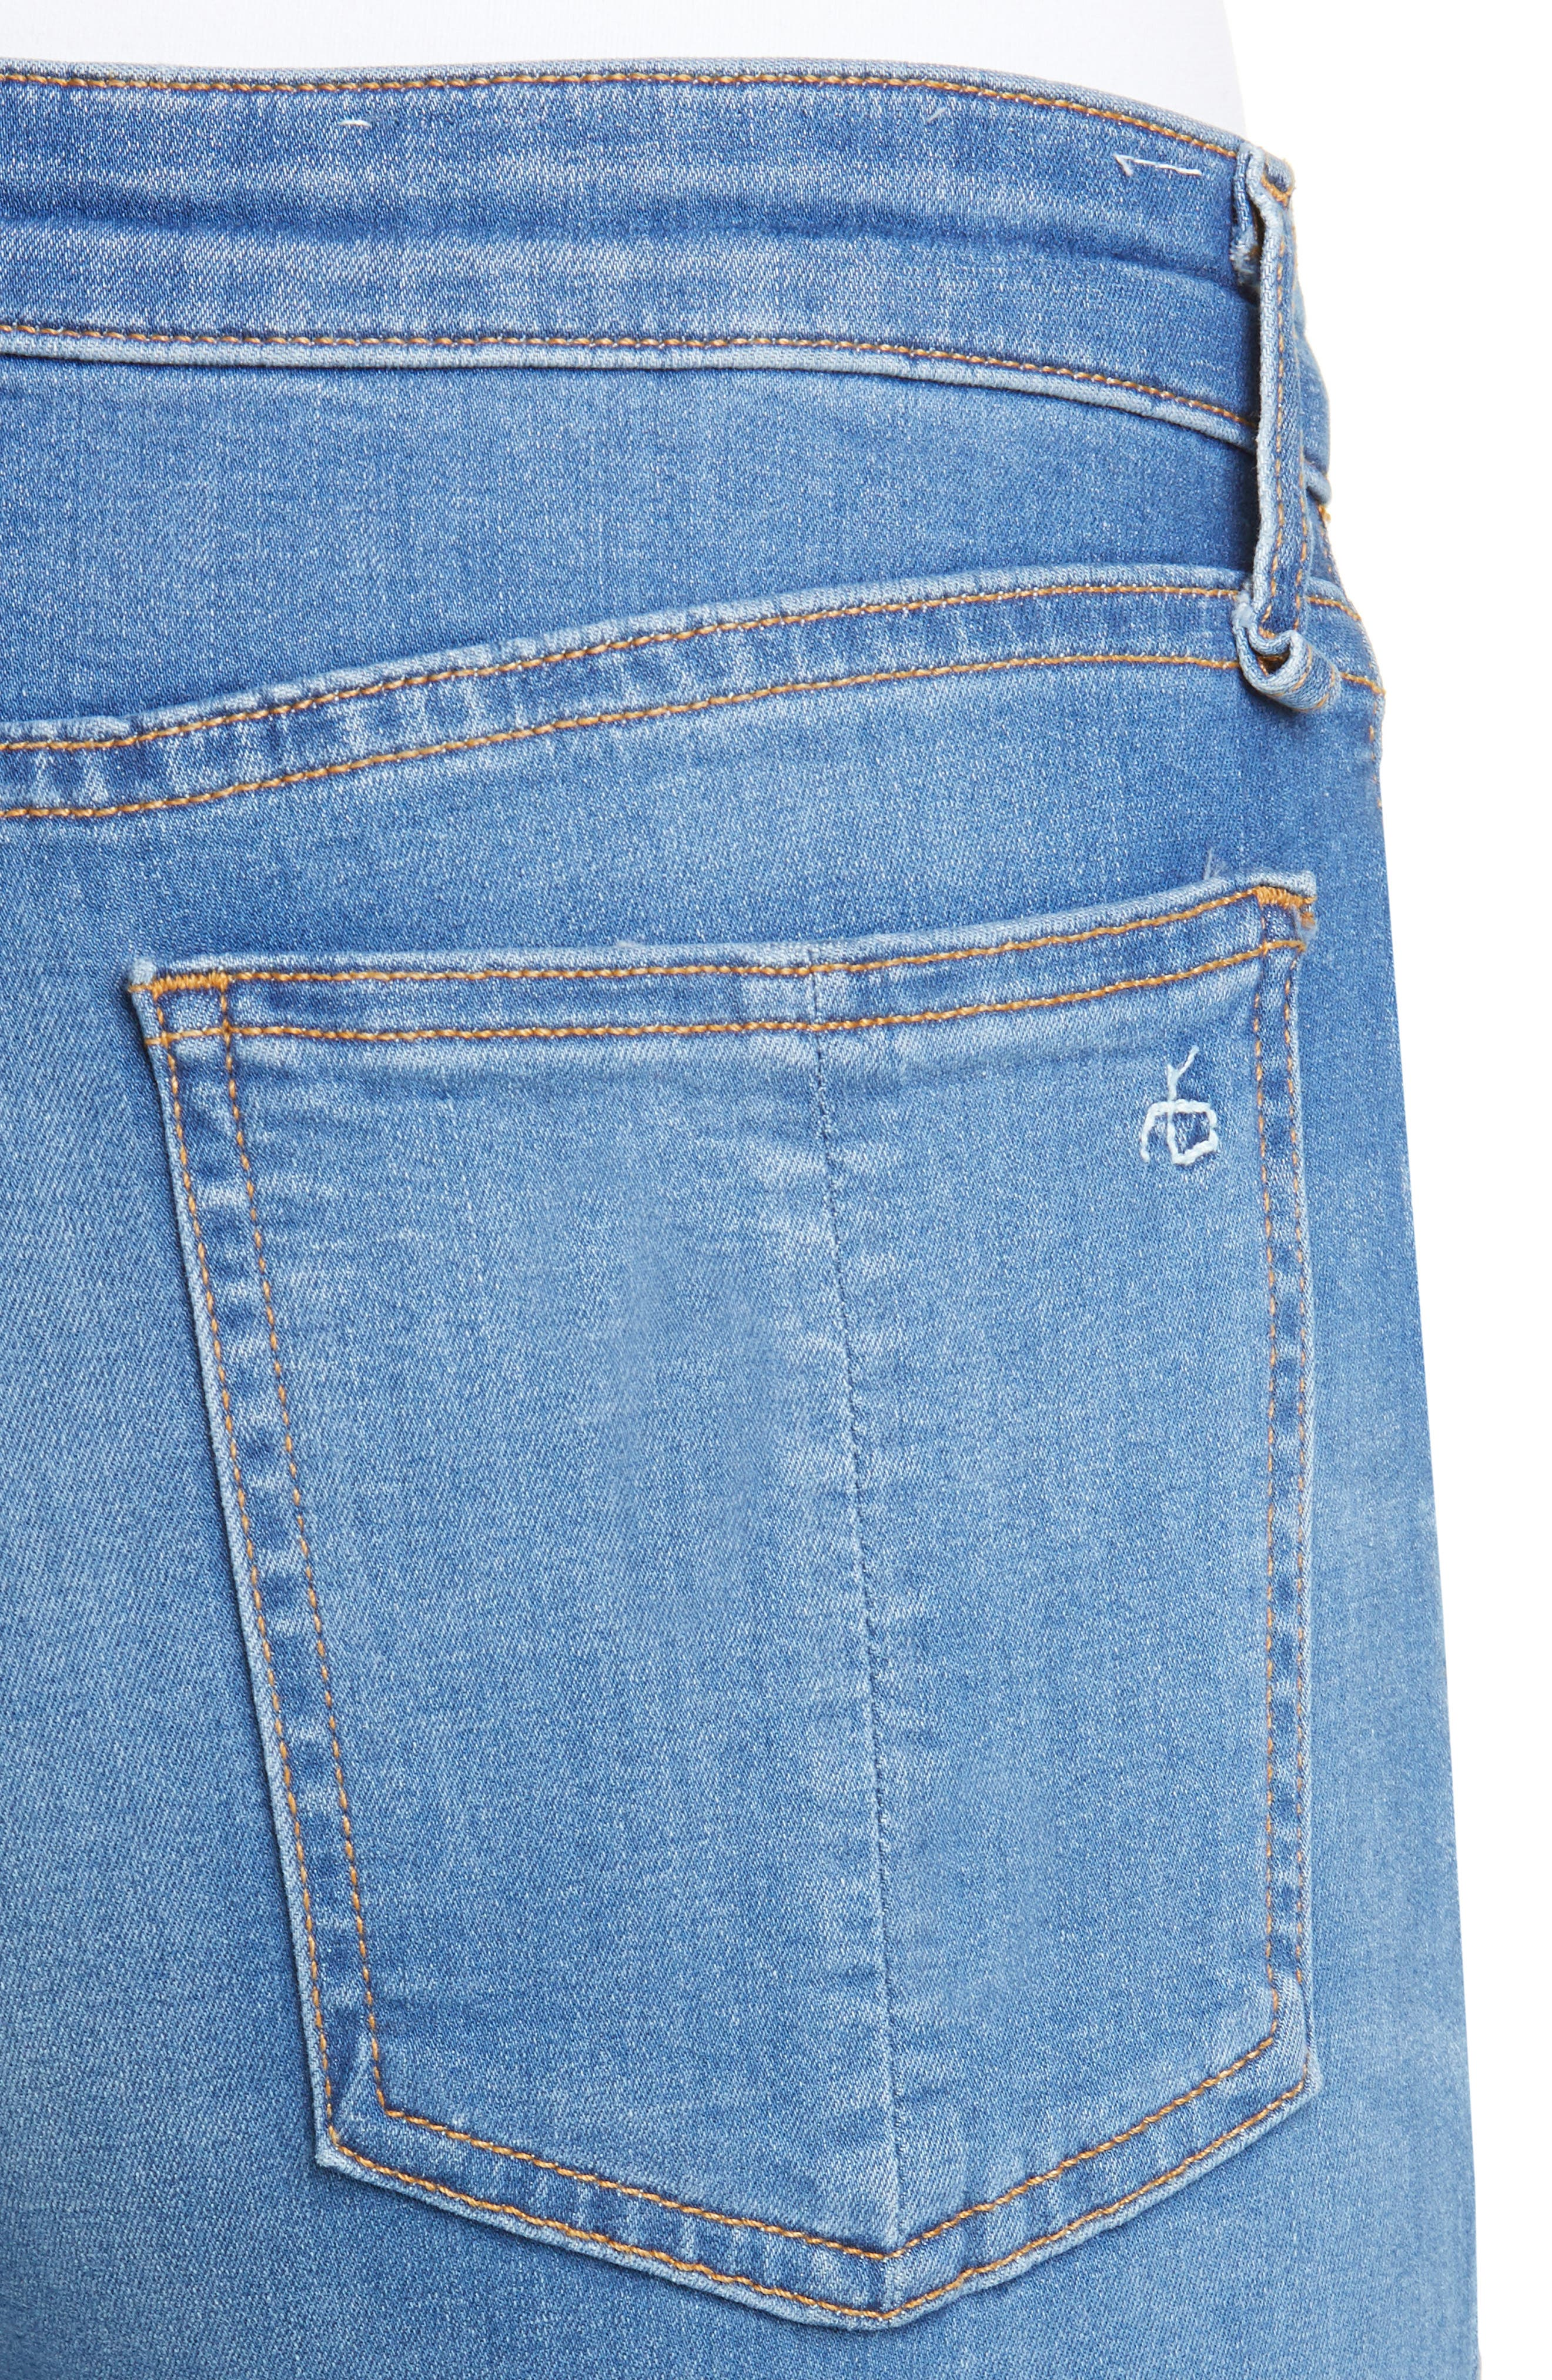 RAG & BONE, Cate High Waist Ankle Skinny Jeans, Alternate thumbnail 5, color, FLINT